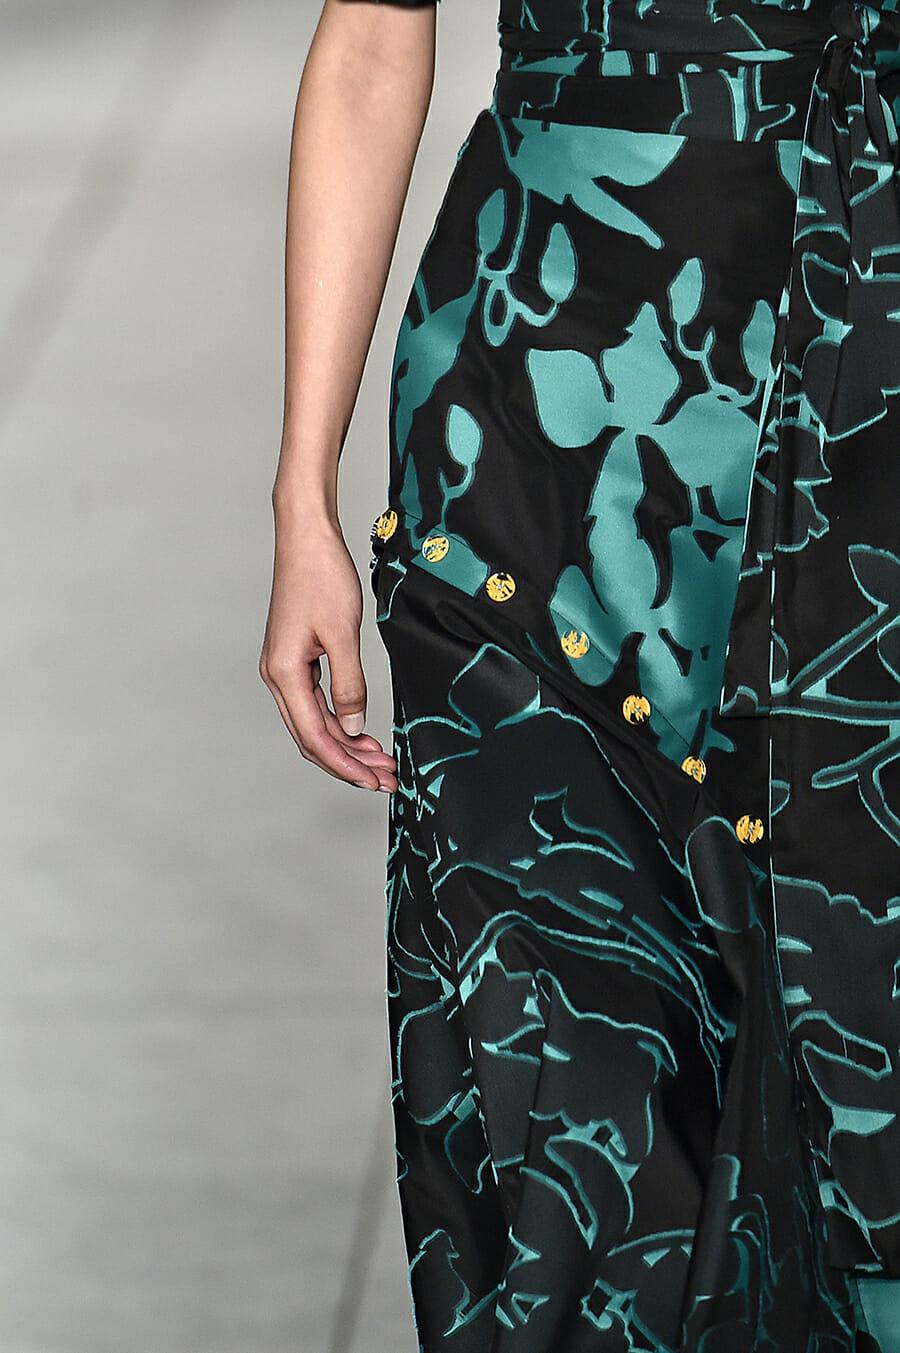 Carolina-Herrera-New-York-Fashion-Week-Spring-Summer-2018-NY-September-2017-look22-detail3